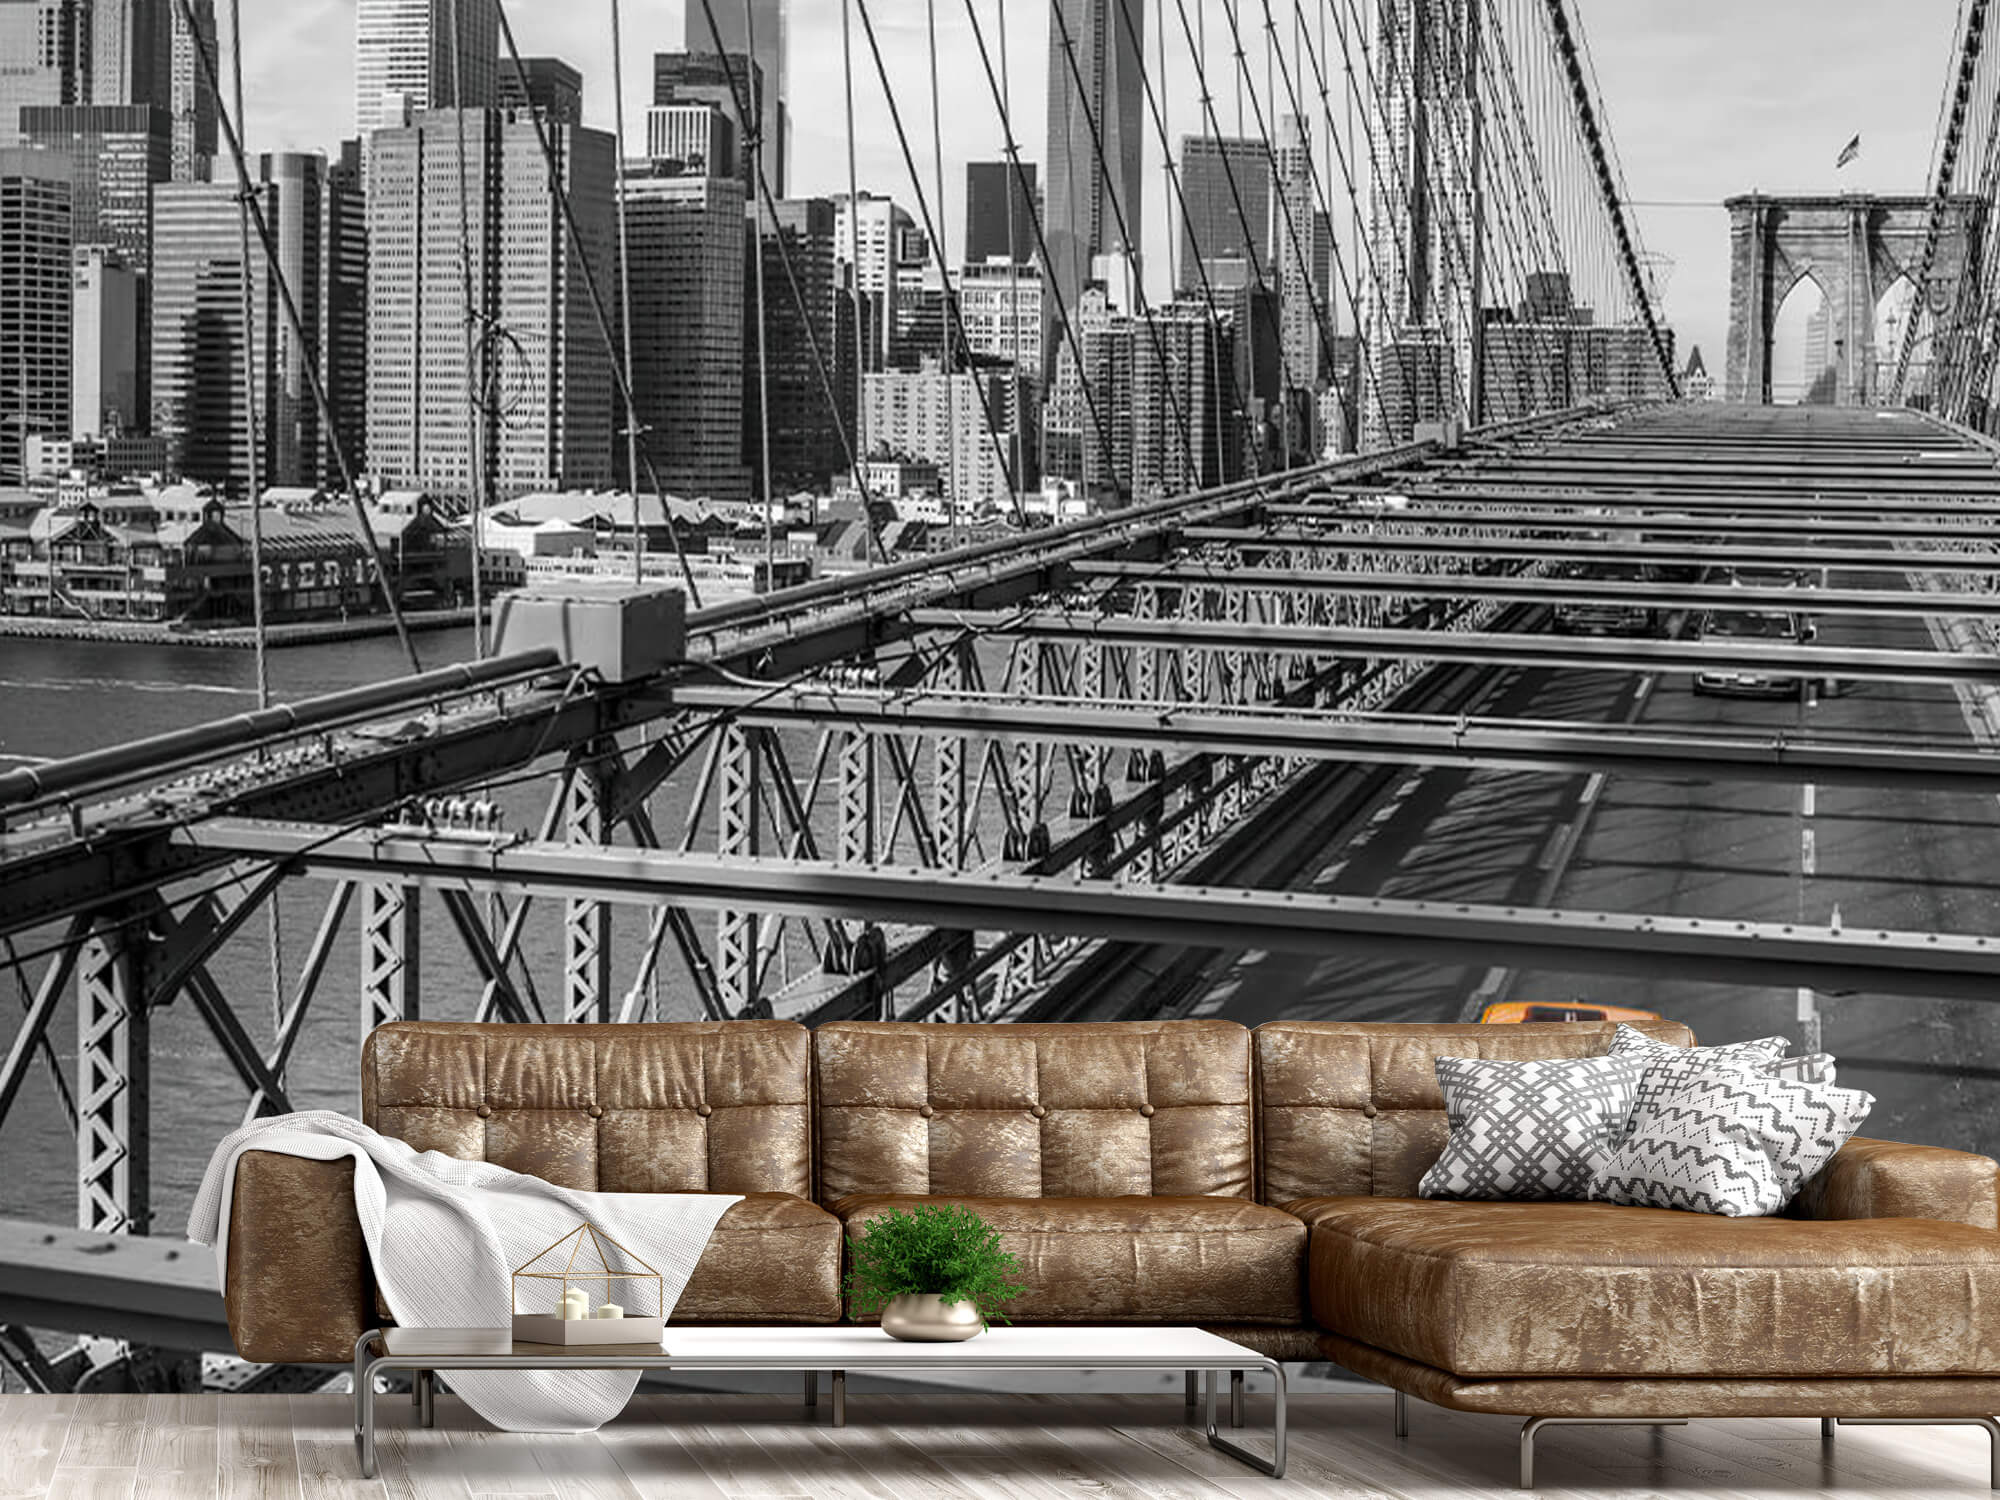 Un taxi sur le pont de Brooklyn 17